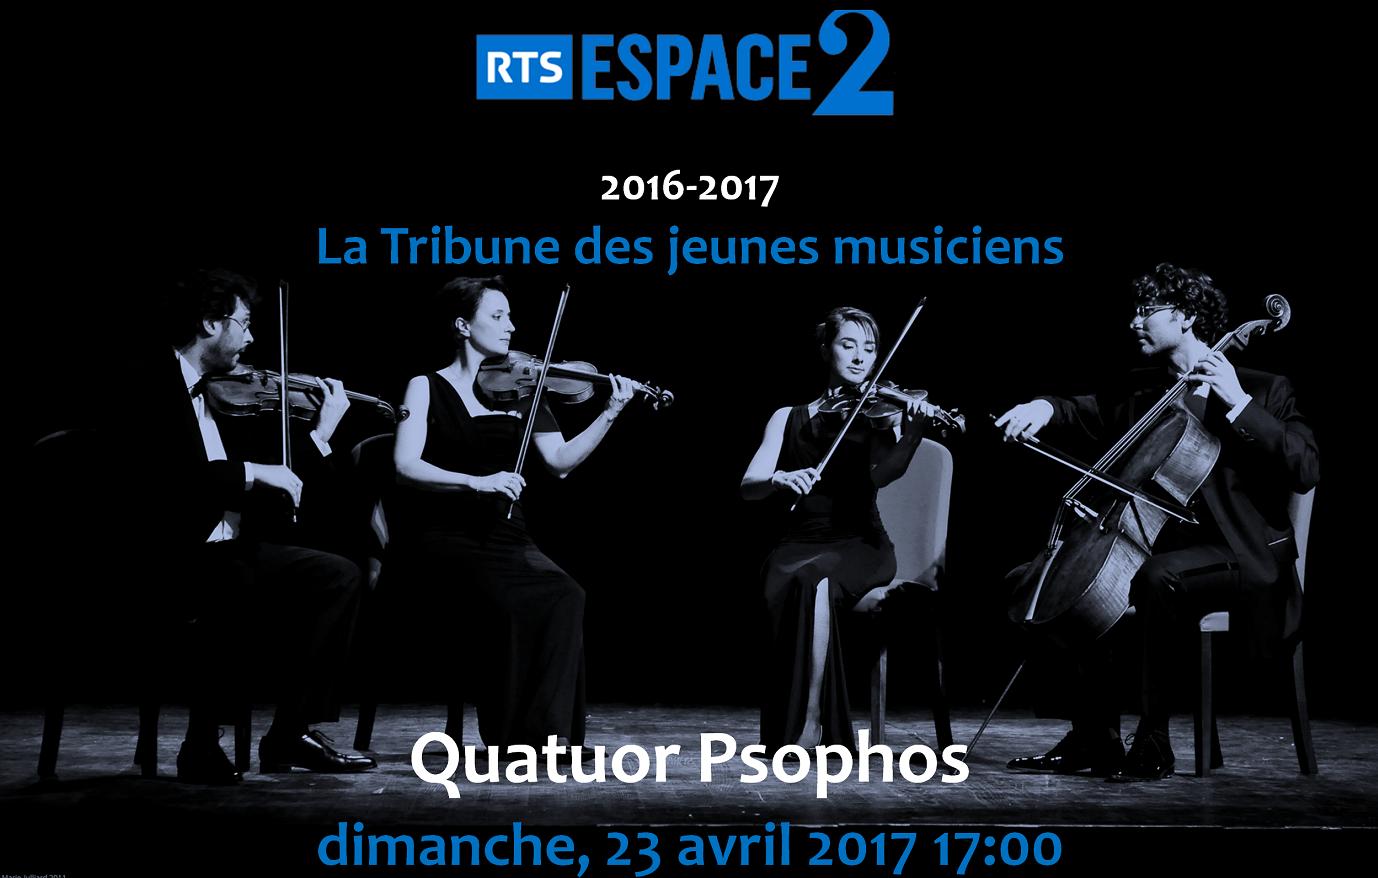 201704 RTS Espace 2